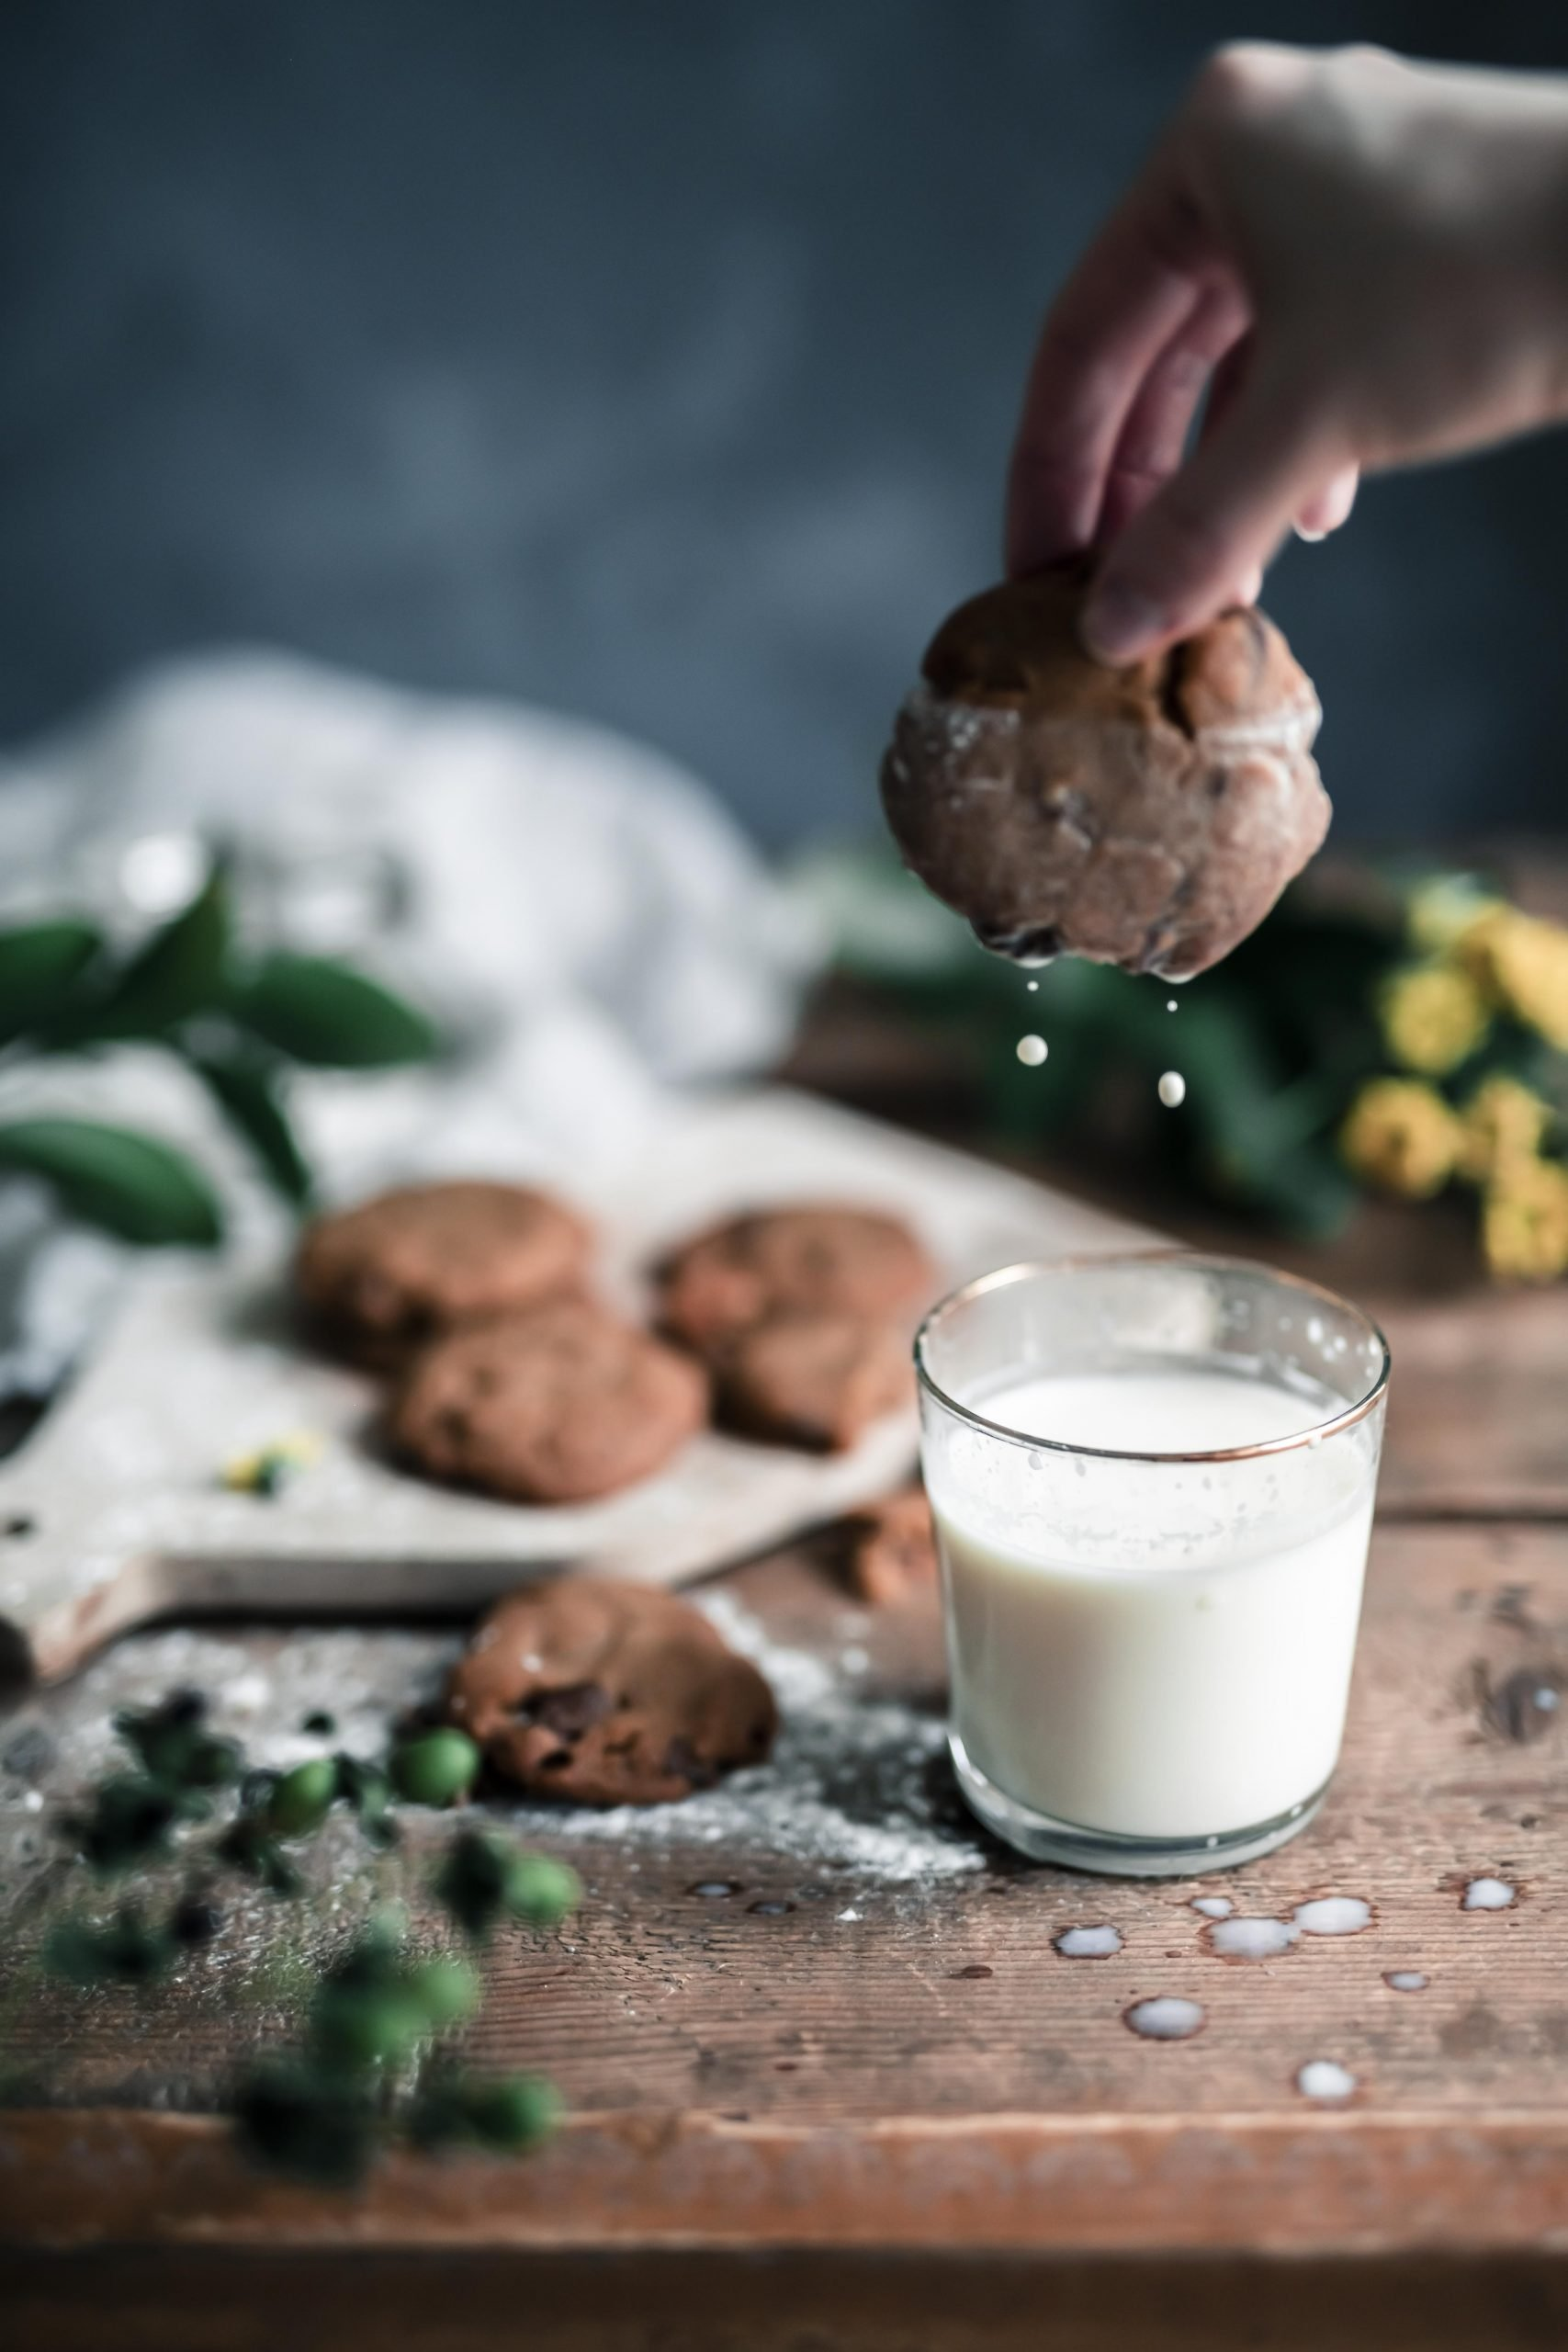 Chocolate chip cookiet Emma Ivane